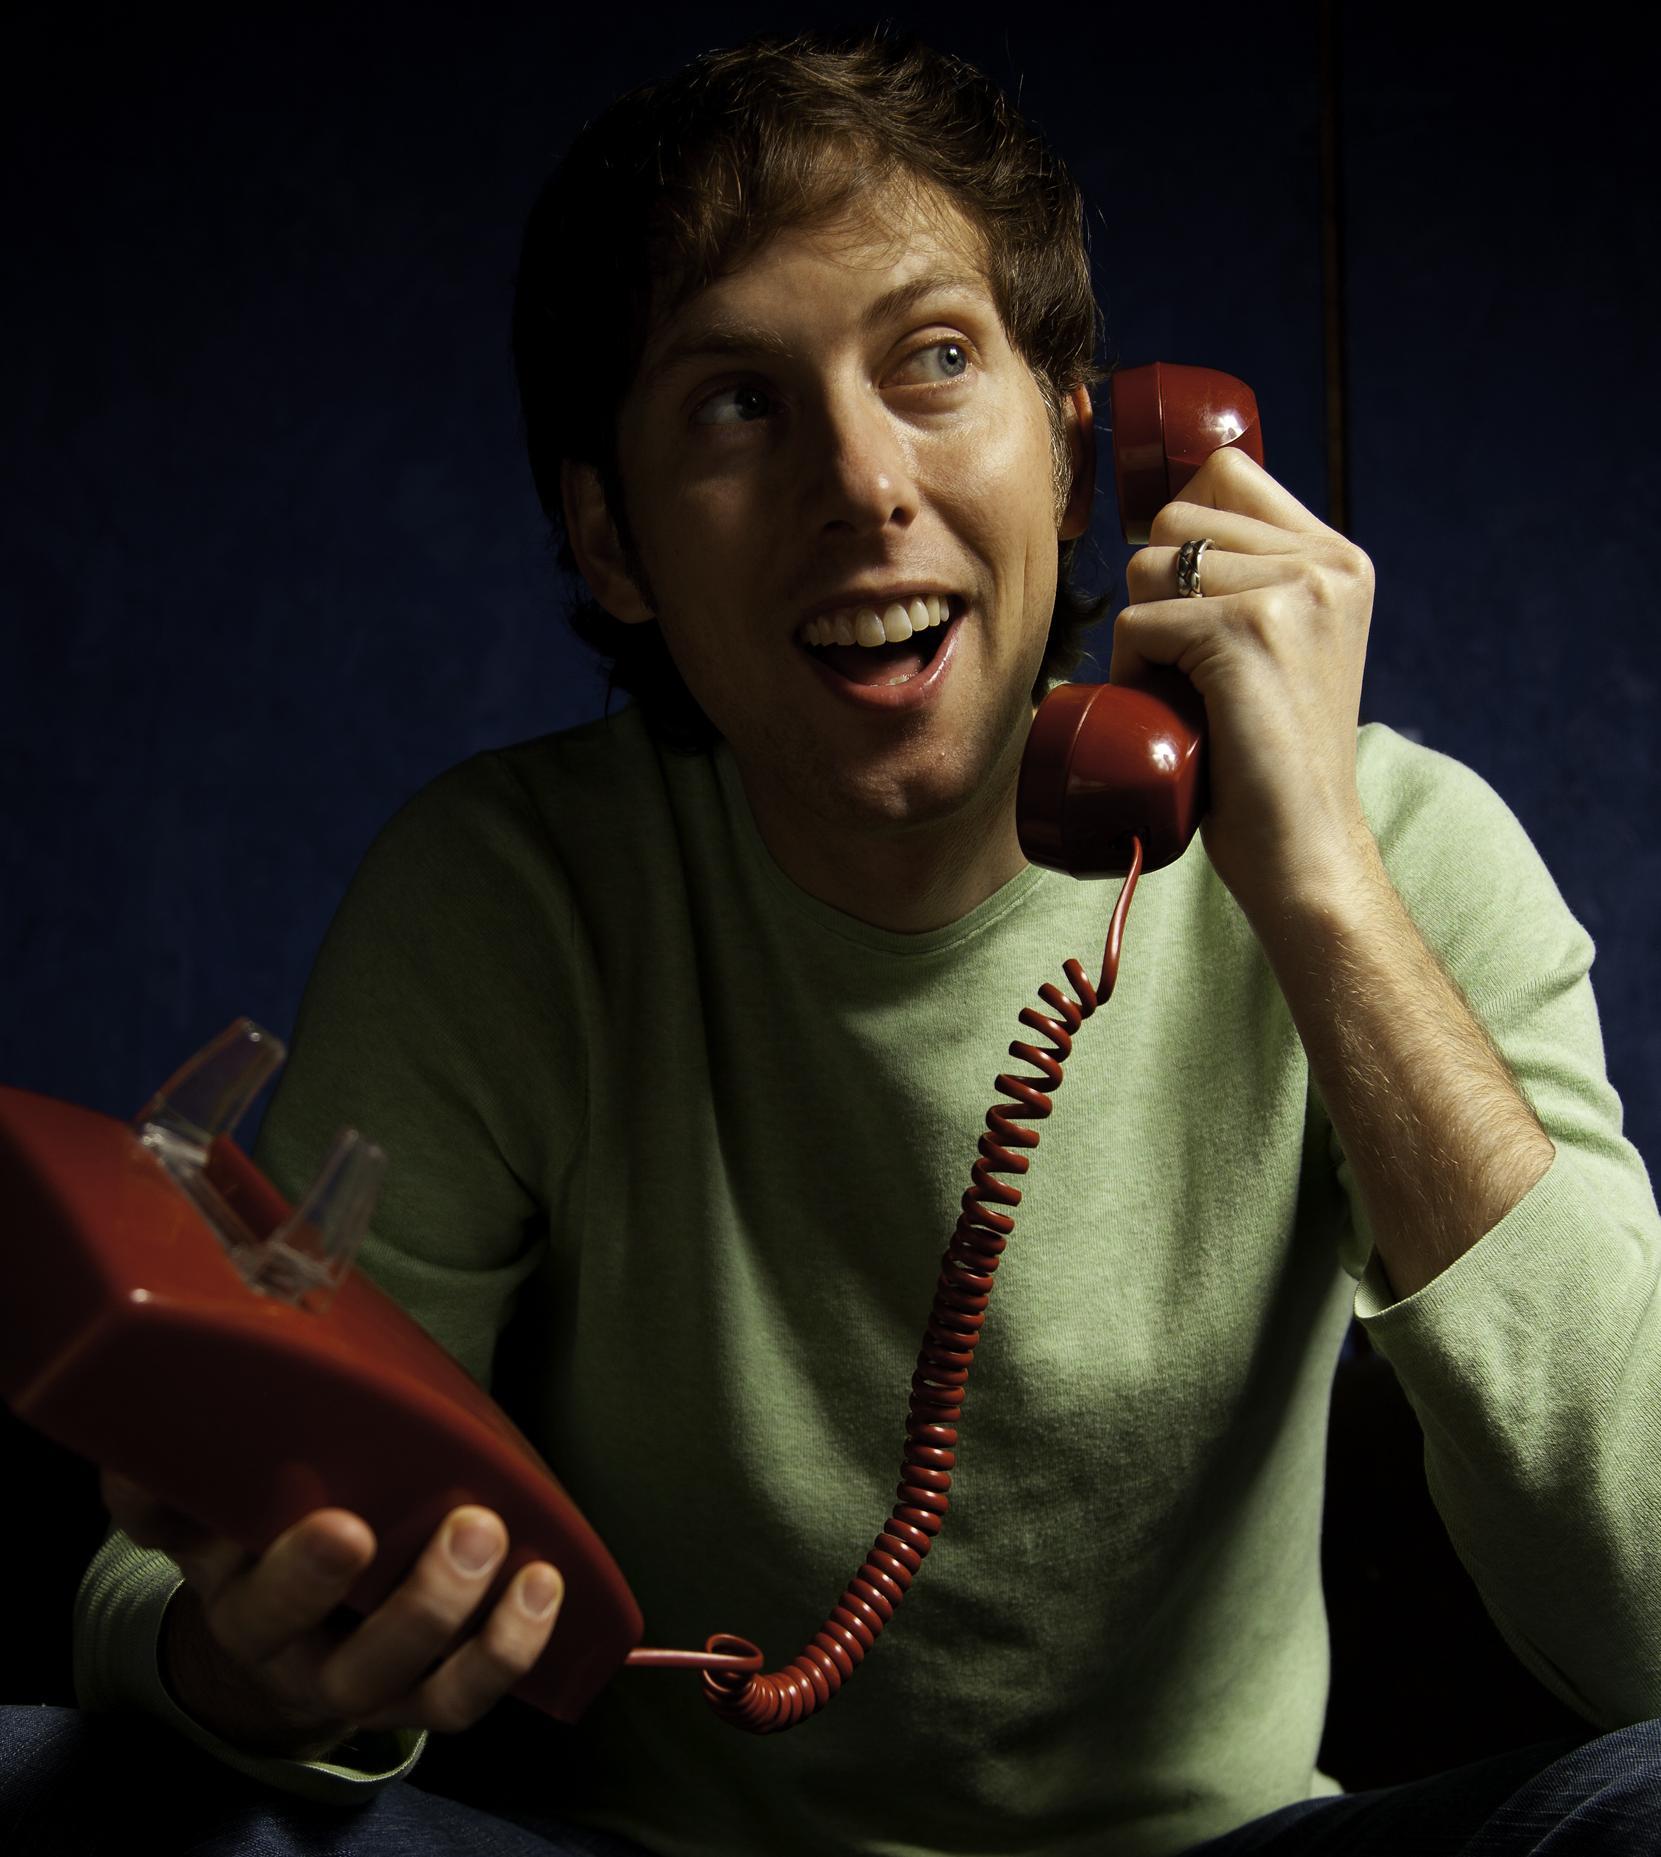 Dax_Jordan_answers_your_call..jpg